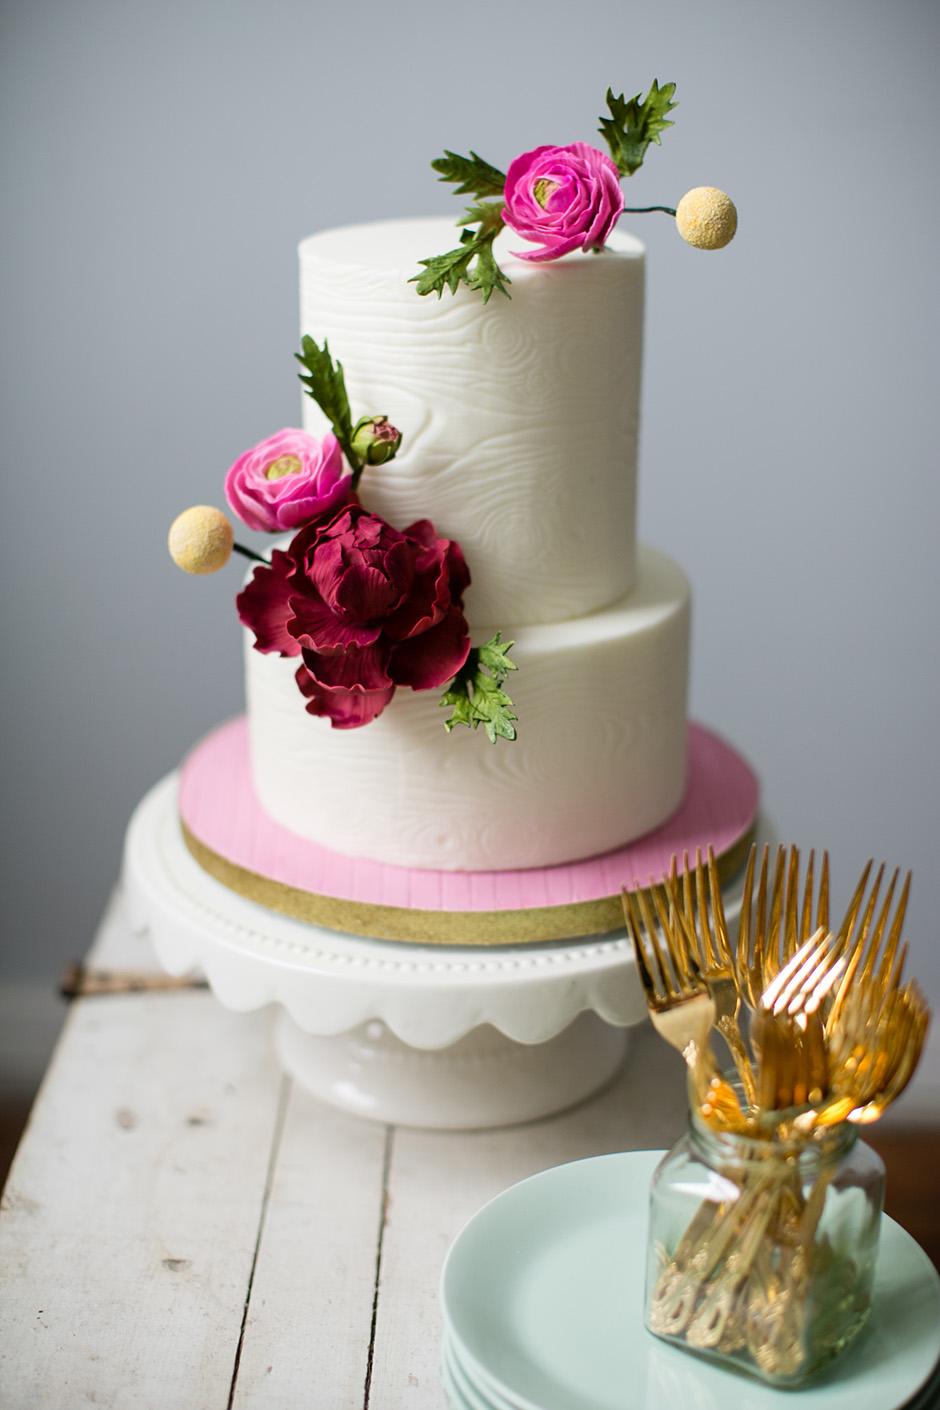 Cake tasting_by Peach Plum Pear